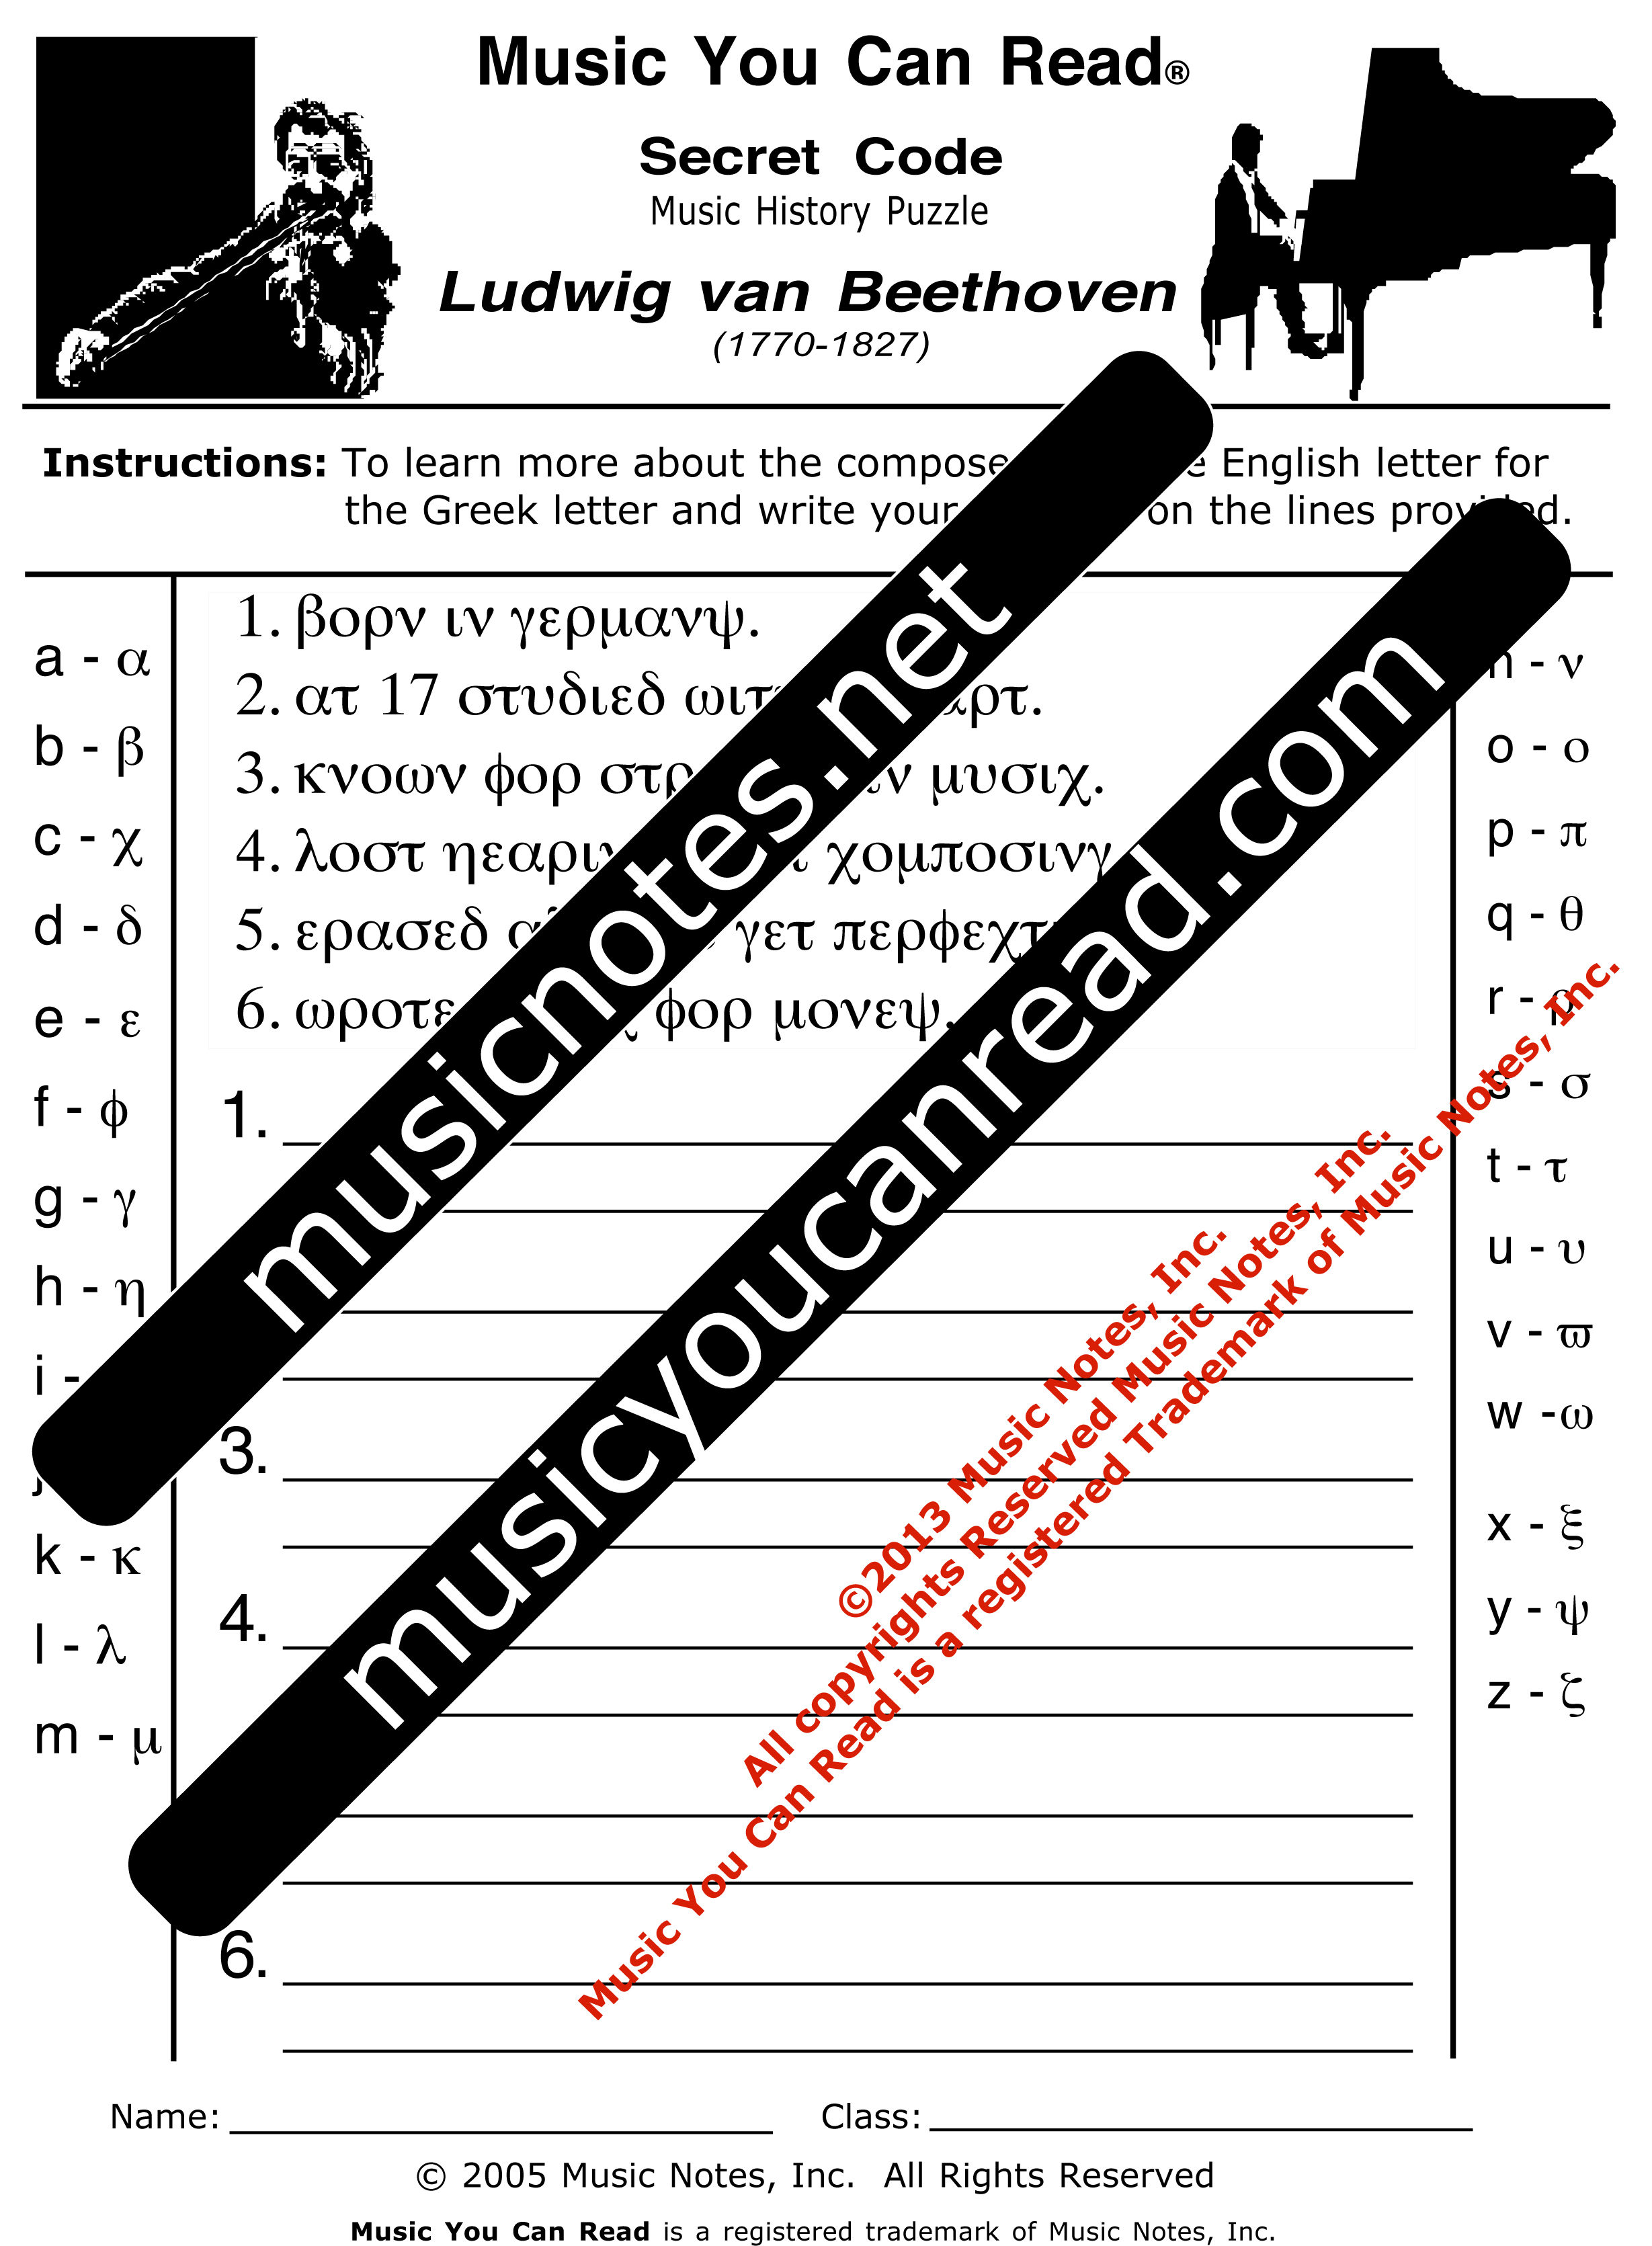 Secret Code – Ludwig van Beethoven